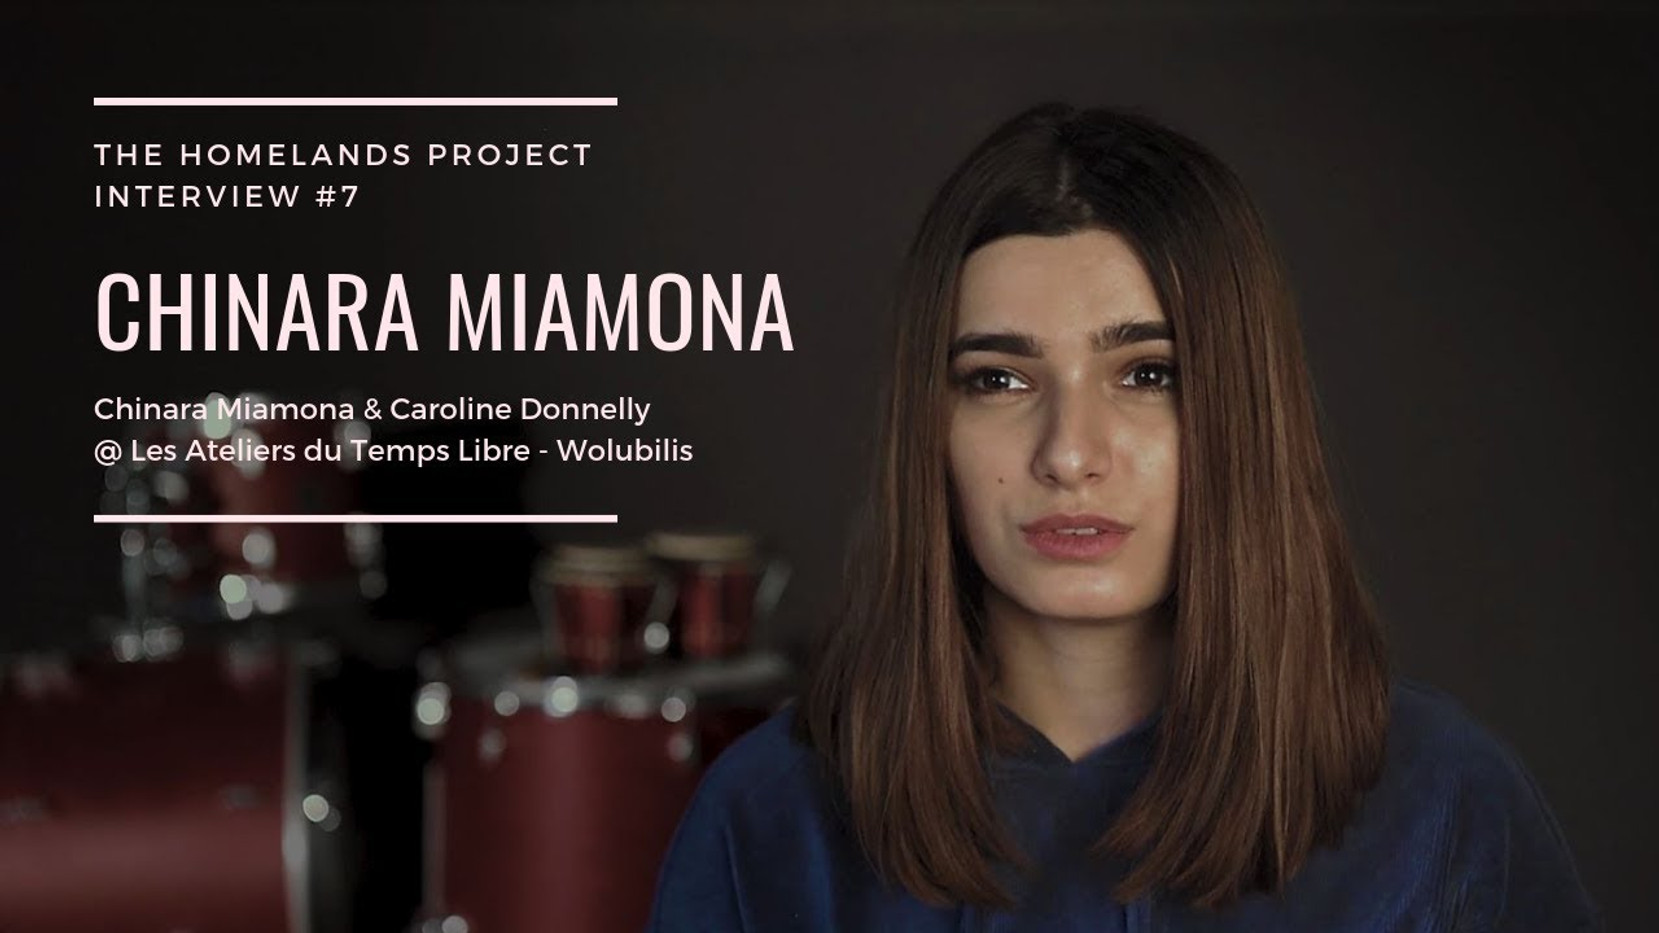 Interview with Chinara Miamona